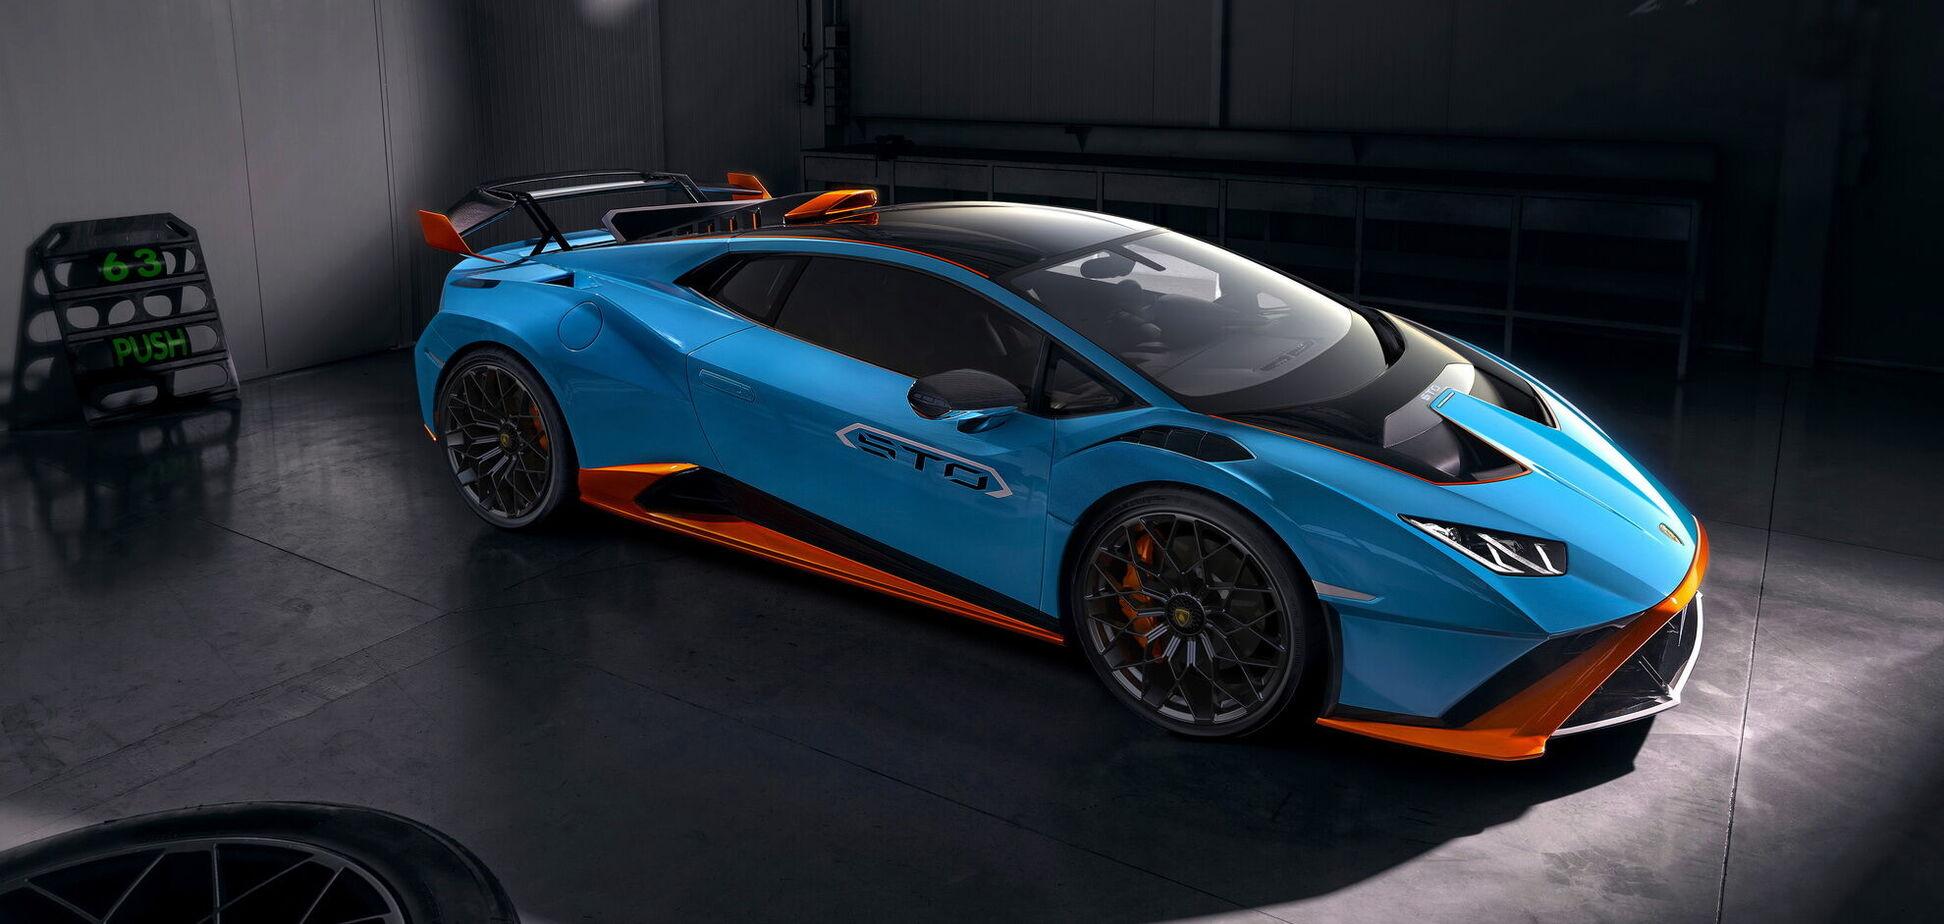 Lamborghini вывел на дороги гоночный болид за 250 тысяч евро